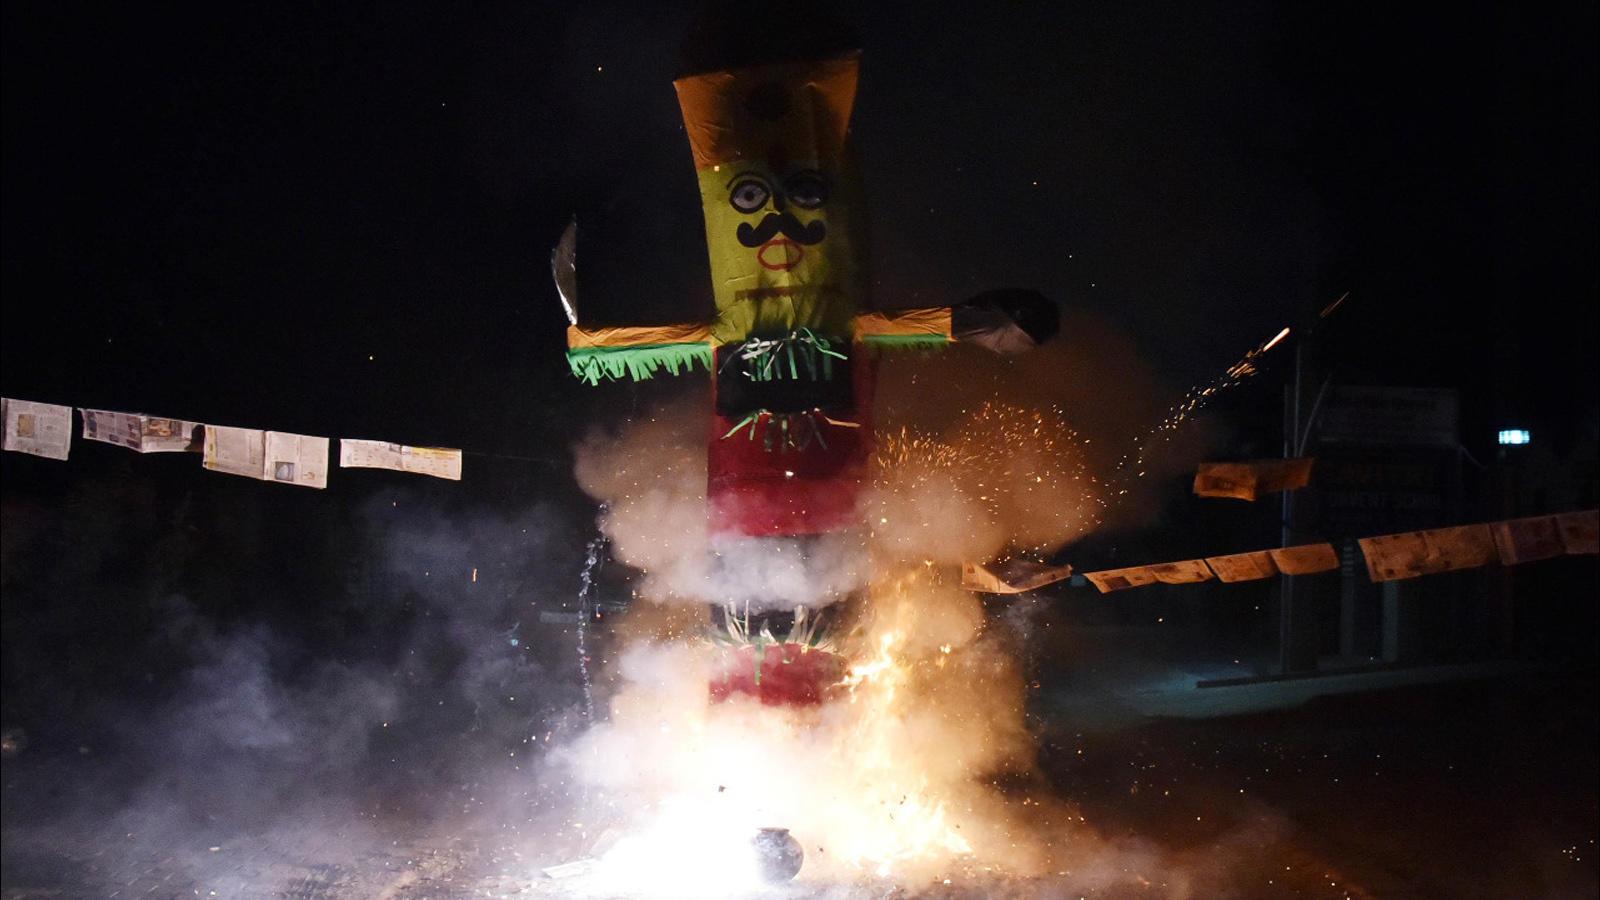 vijayadashmi-celebrated-across-the-country-ravanas-effigies-burnt